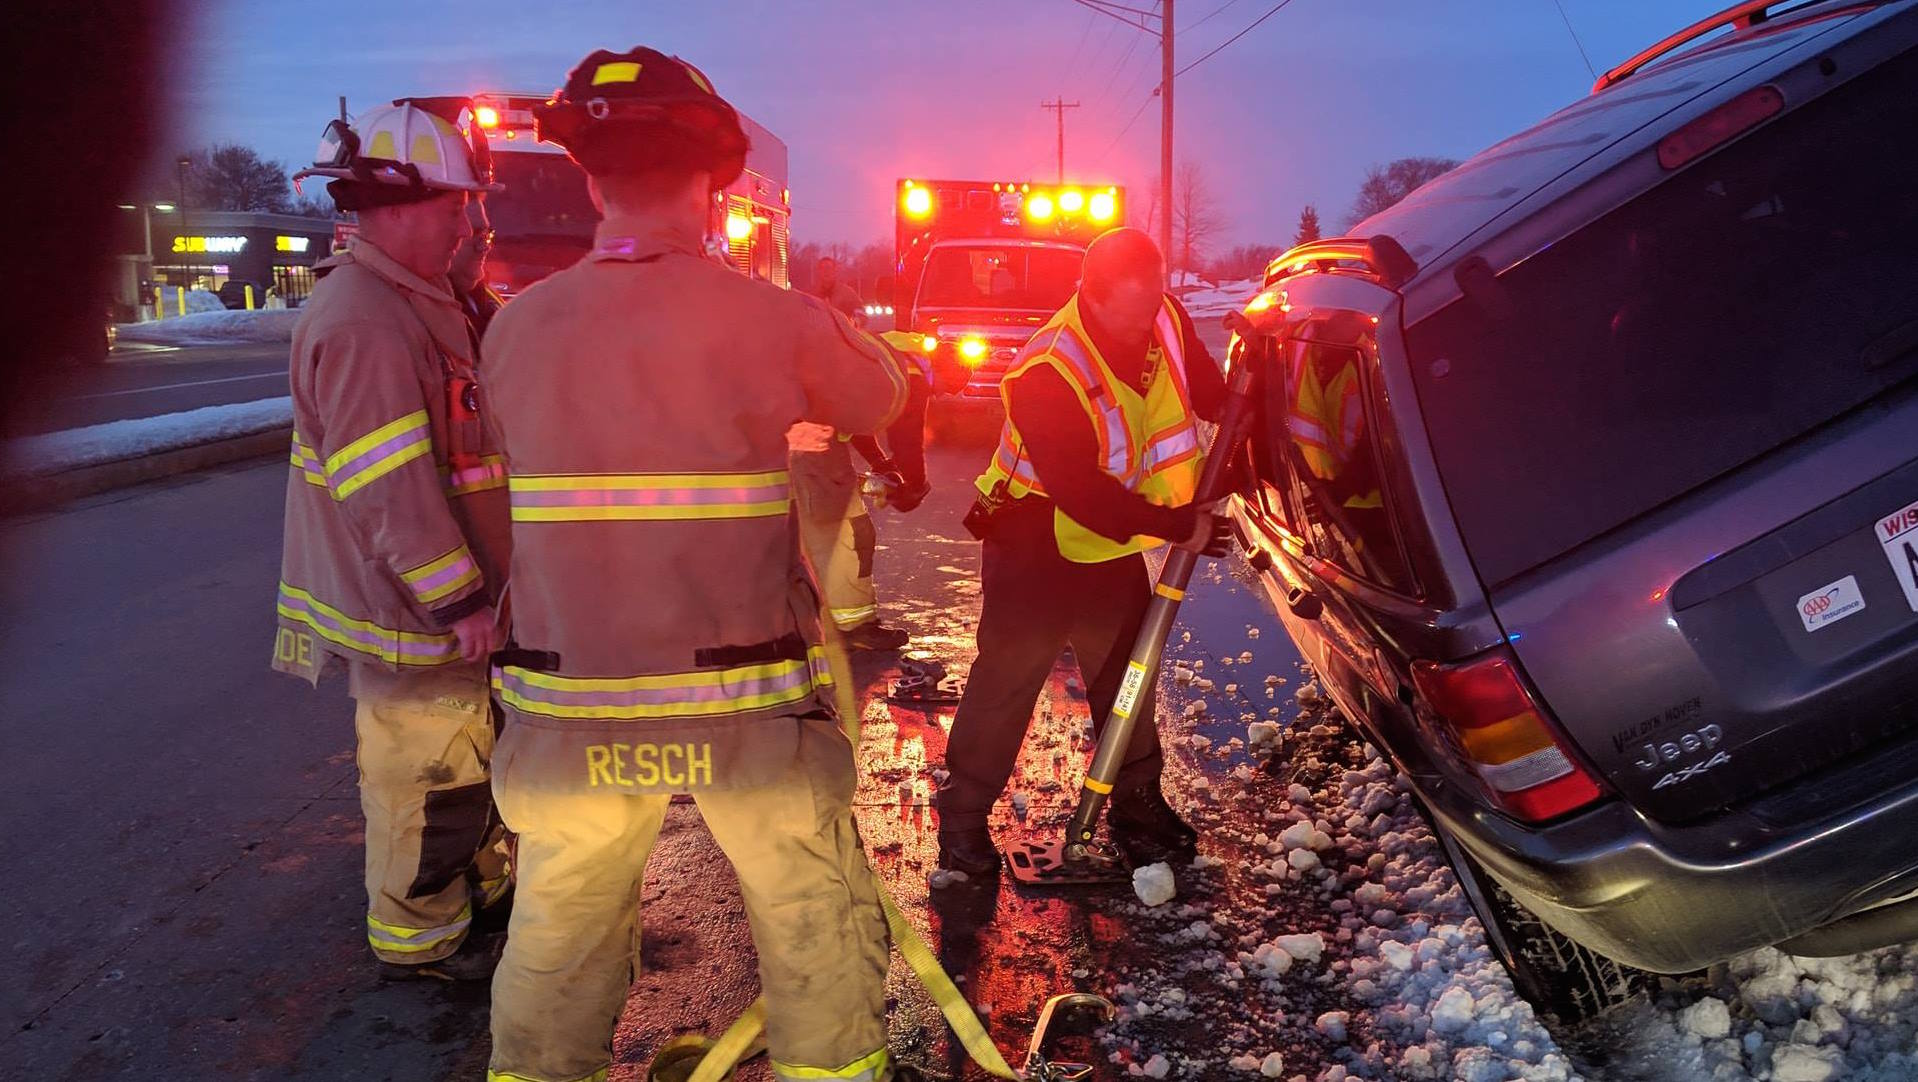 Firefighters work to remove a driver from a vehicle Feb. 22, 2019 on Crooks Avenue in Kaukauna. Kaukauna Fire Department photo